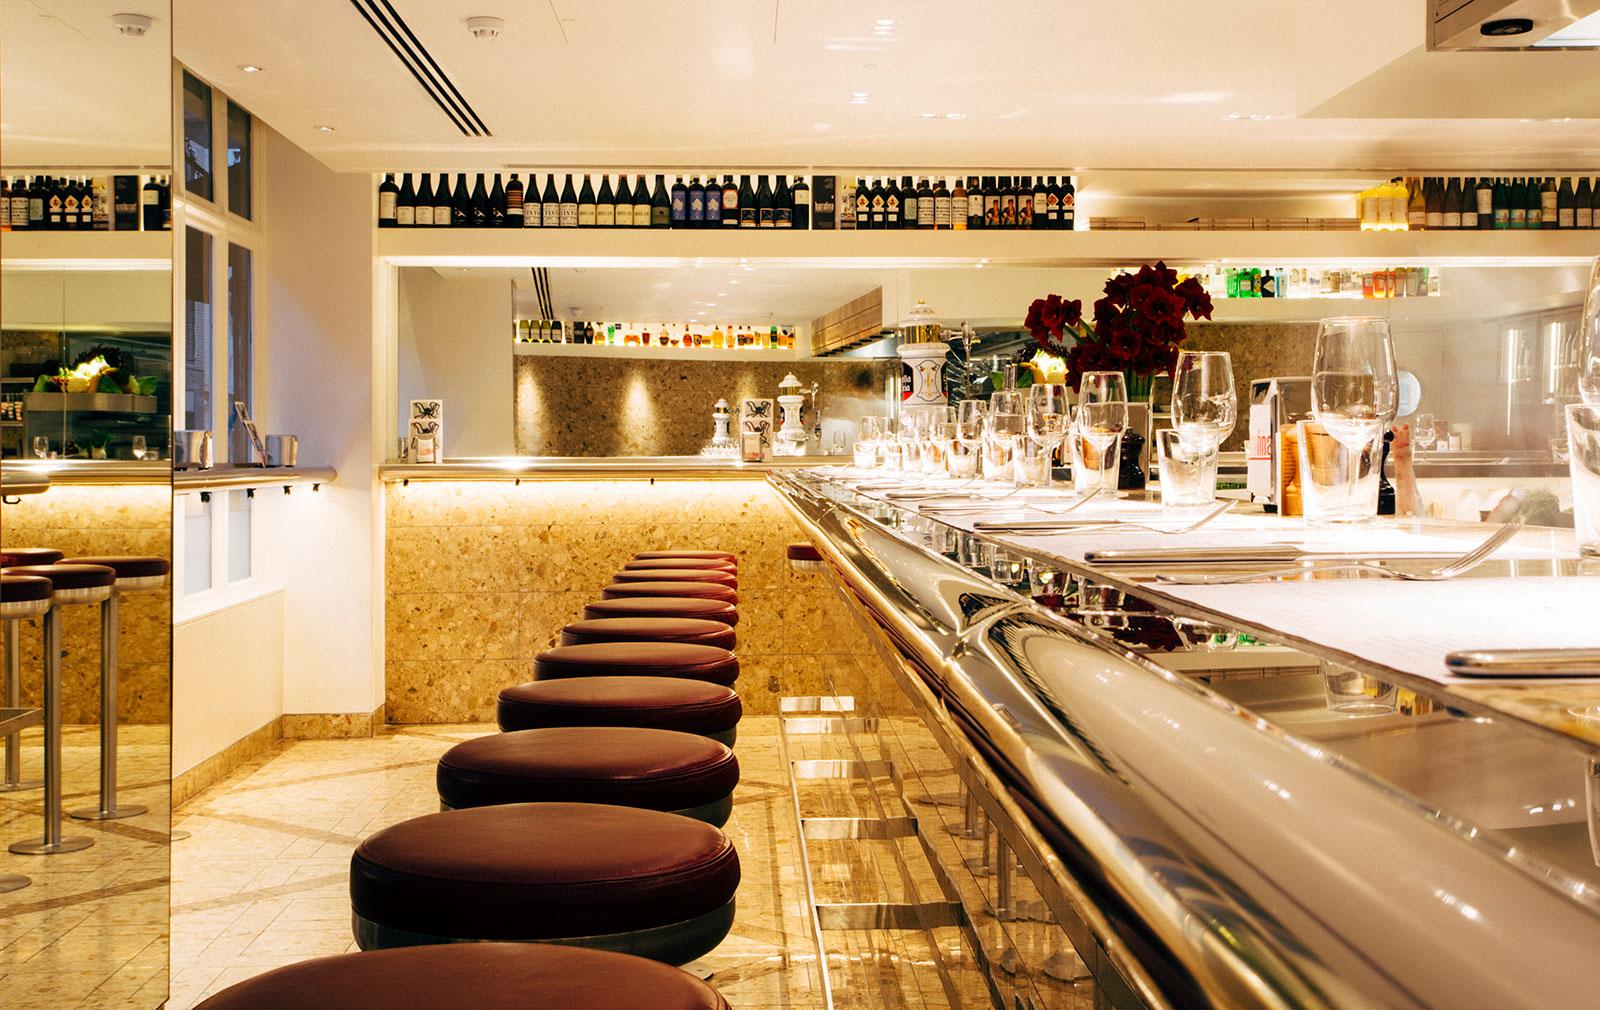 London restaurants: Barrafina Dean Street